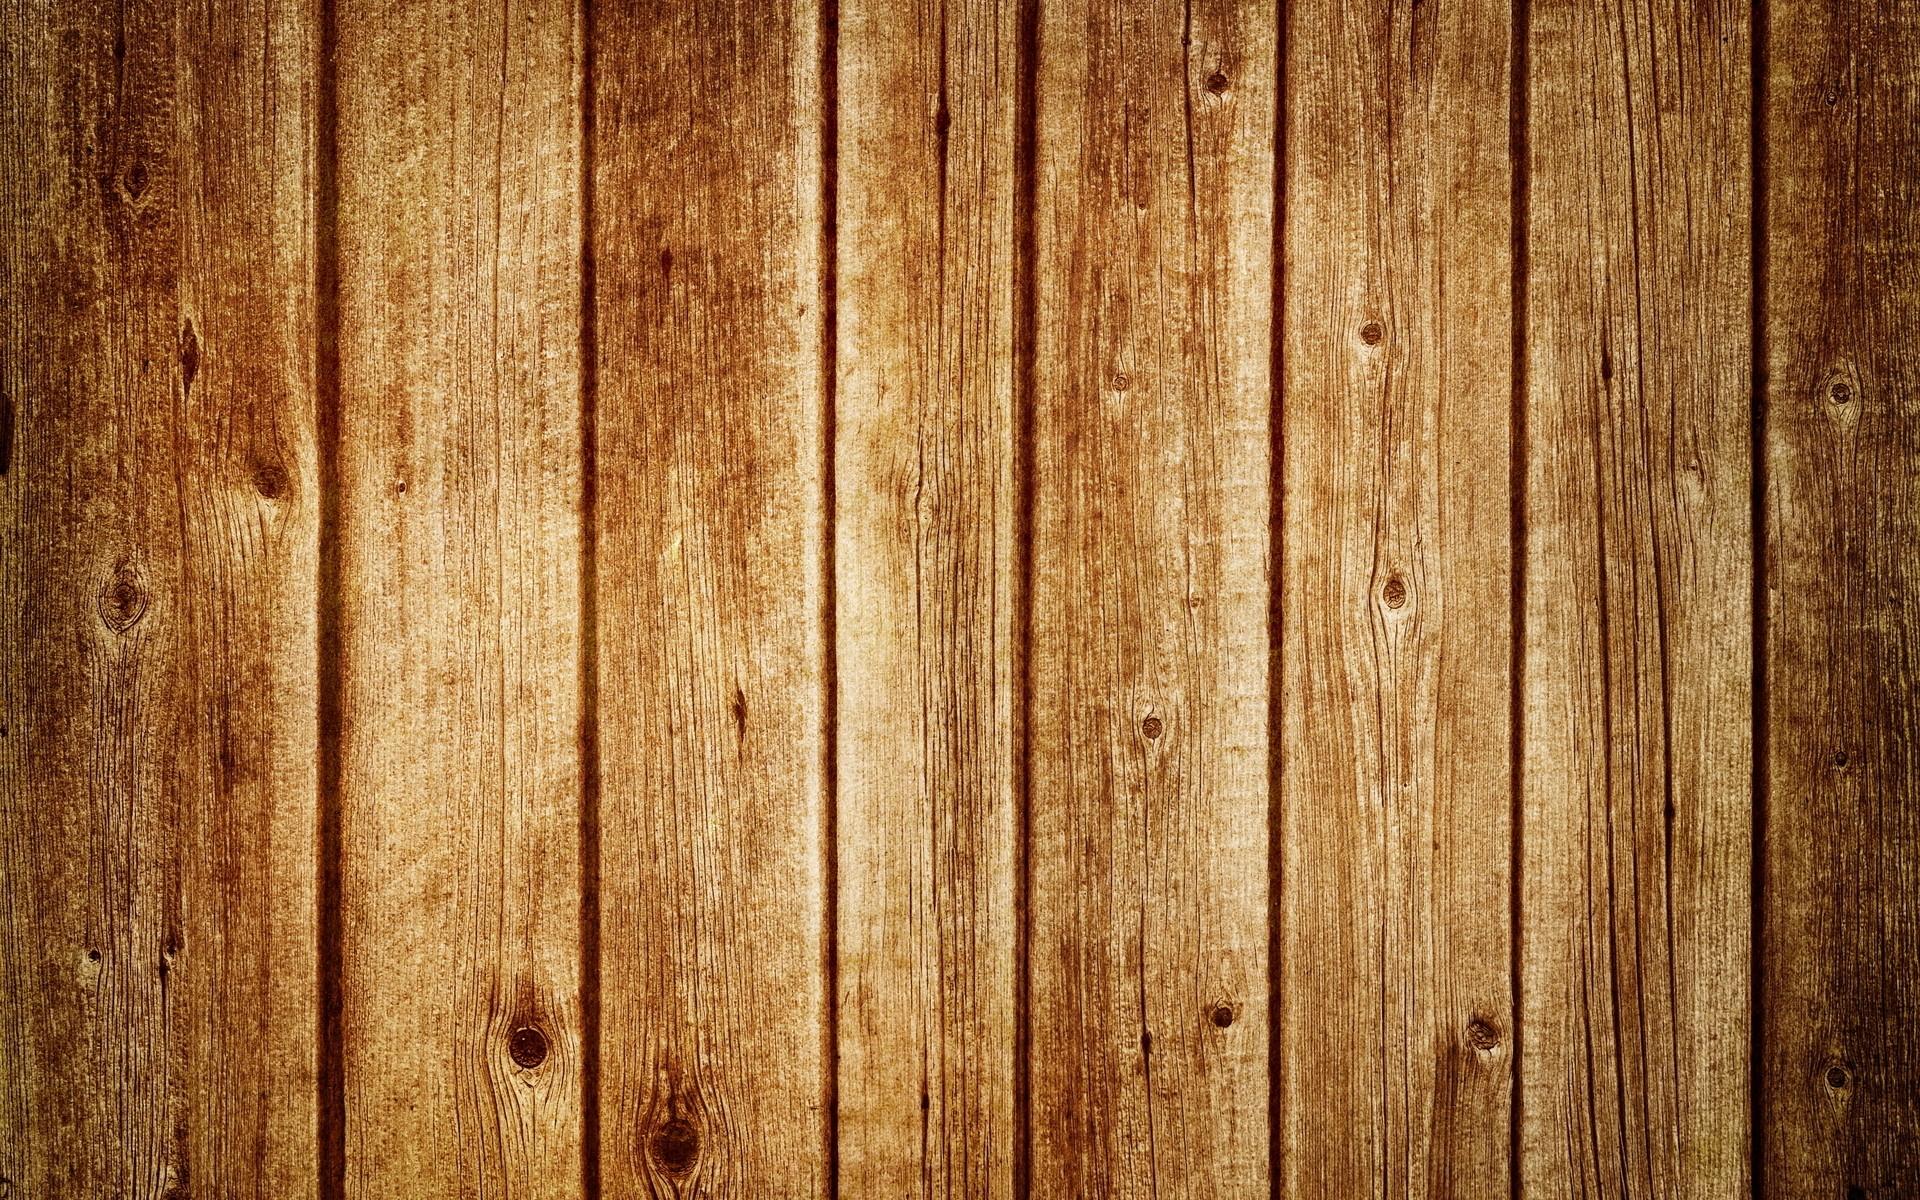 Good Wallpaper High Resolution Wood - 6836-wood-background-1920x1200-for-ipad-pro  HD_20440.jpg